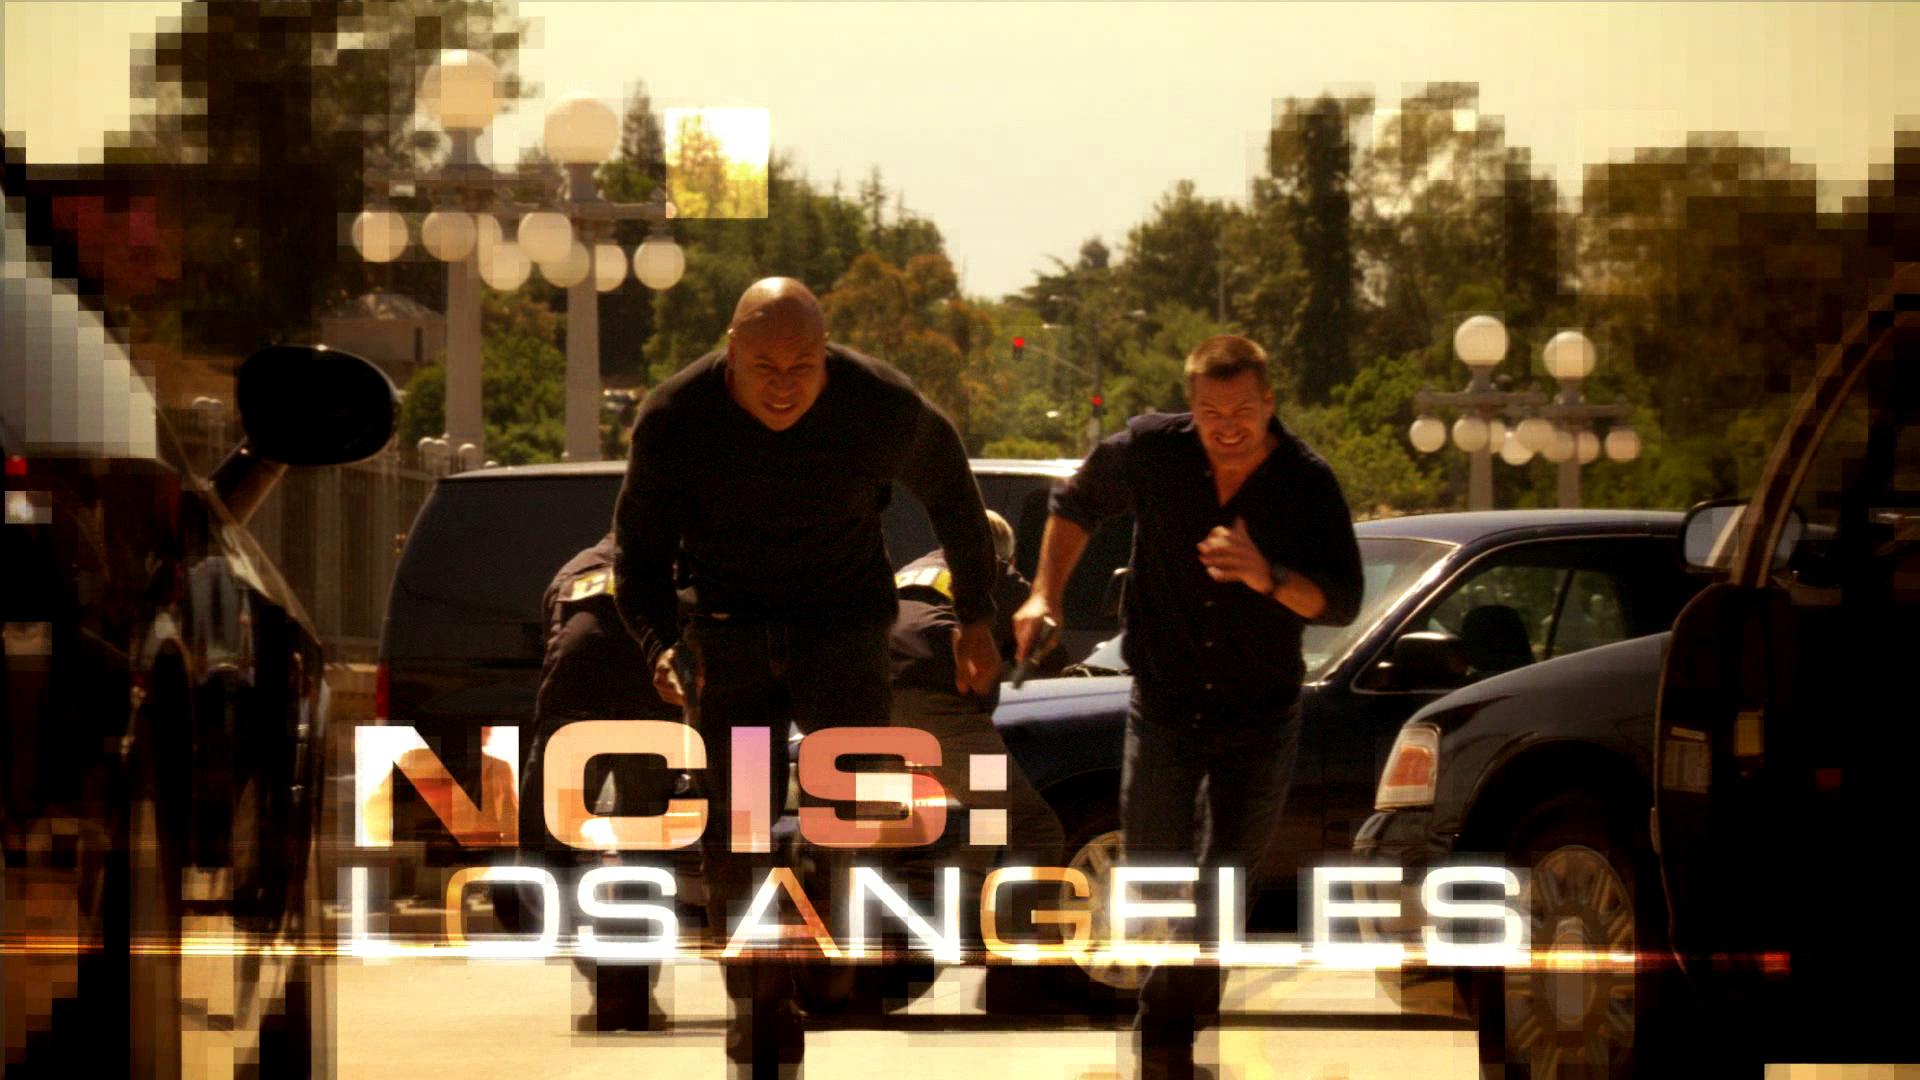 Ncis La: NCIS Los Angeles Wallpaper